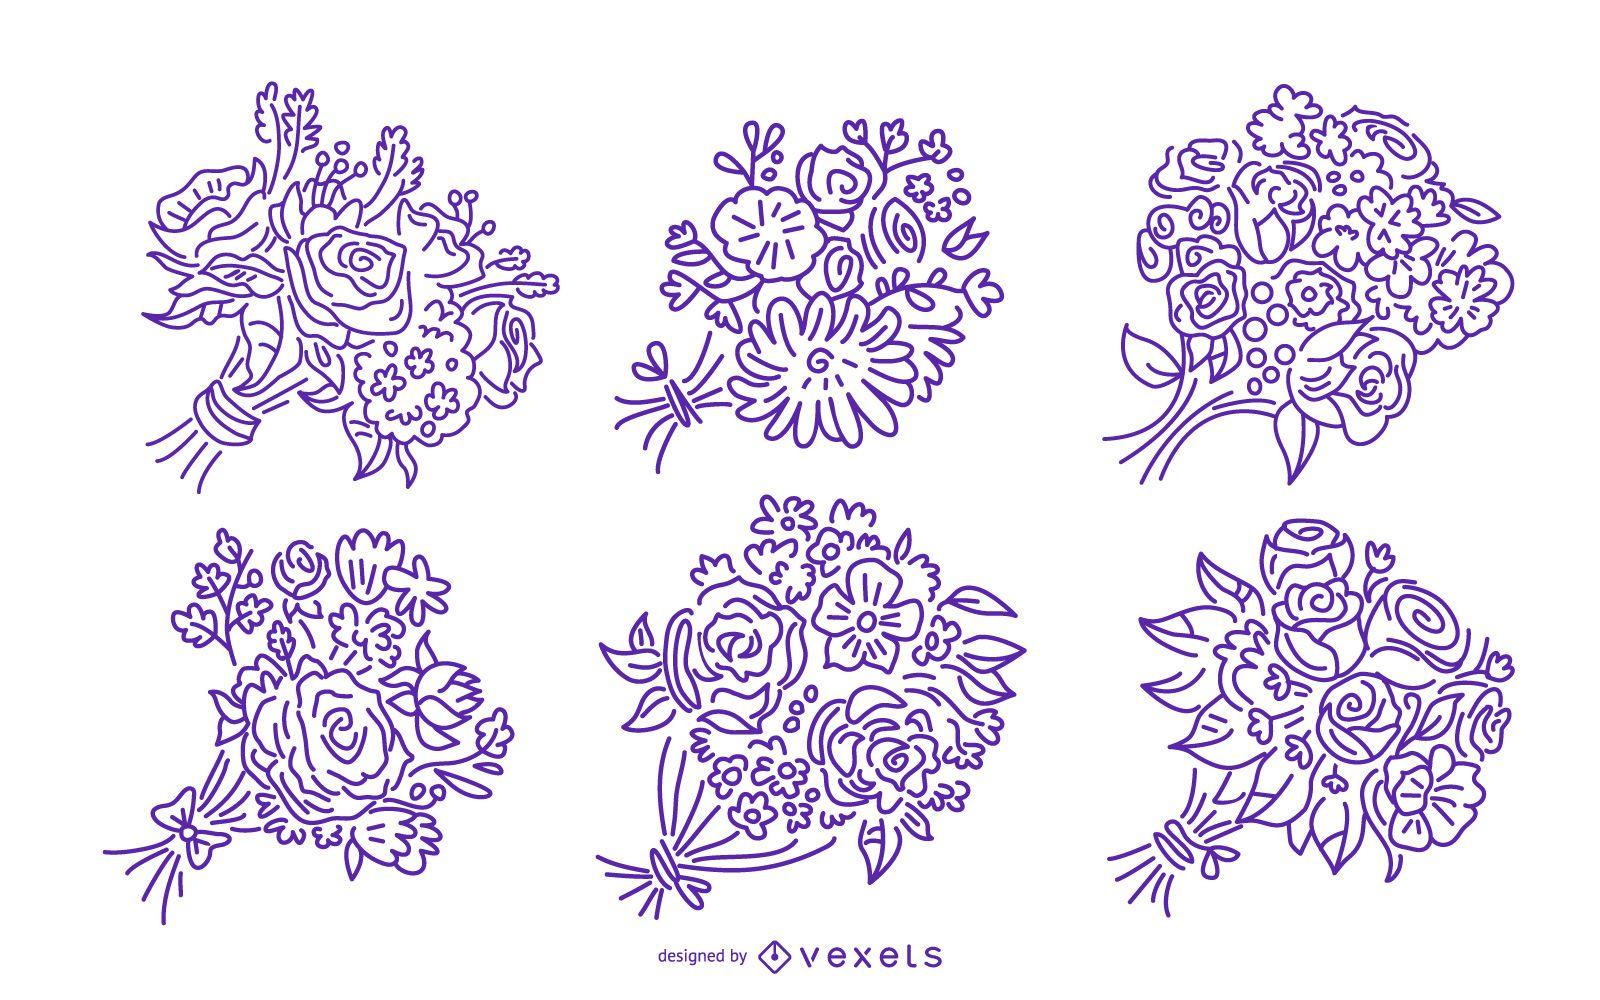 Floral bouquet stroke illustration set